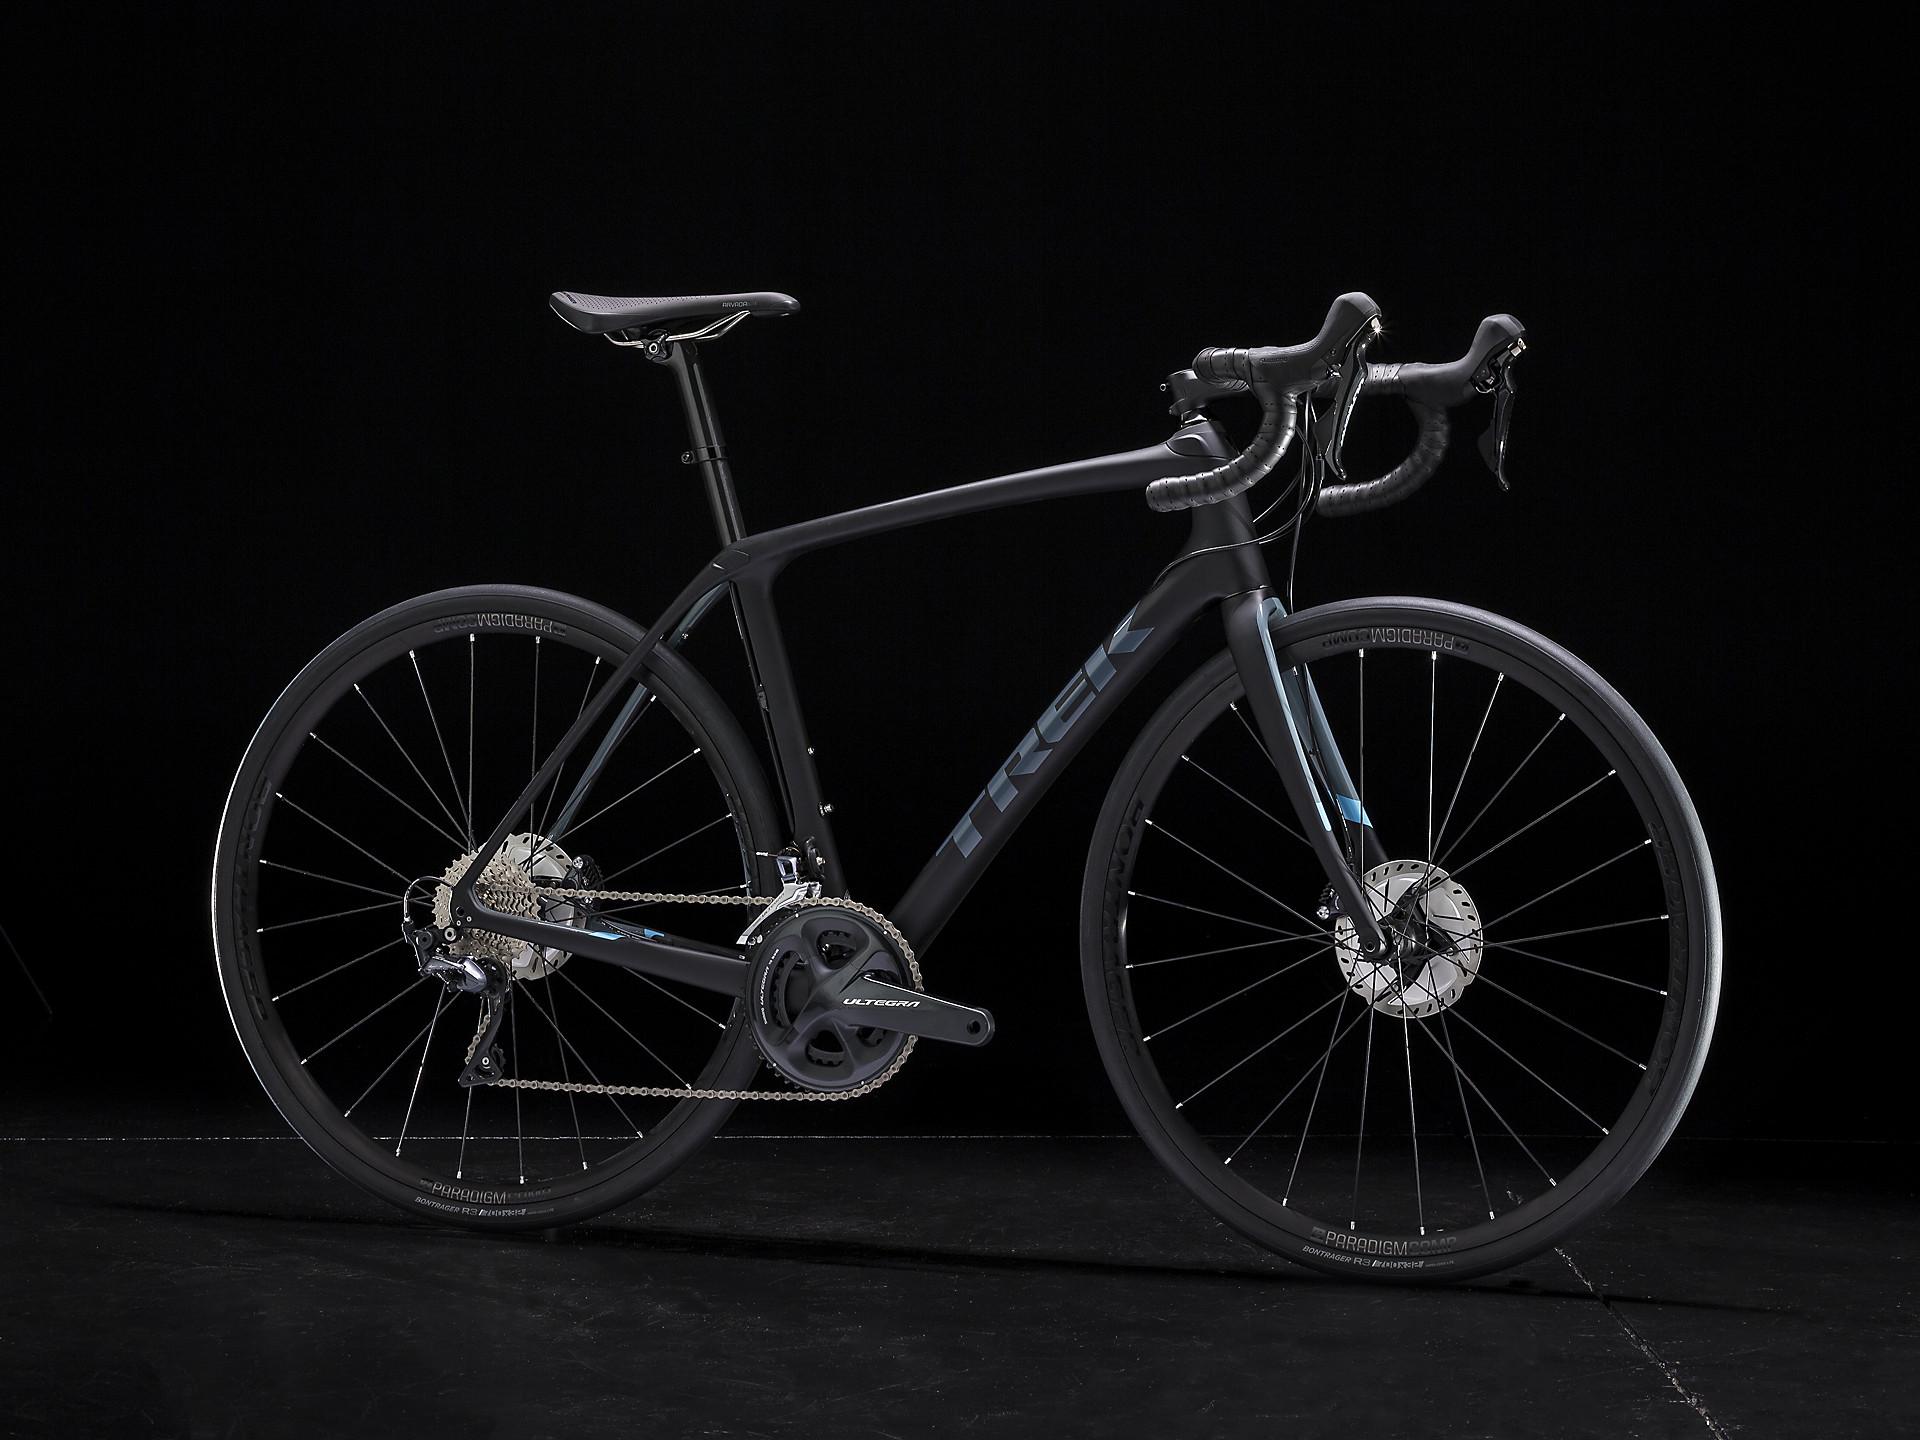 52b15a4c517 Domane SLR 6 Disc | Trek Bikes